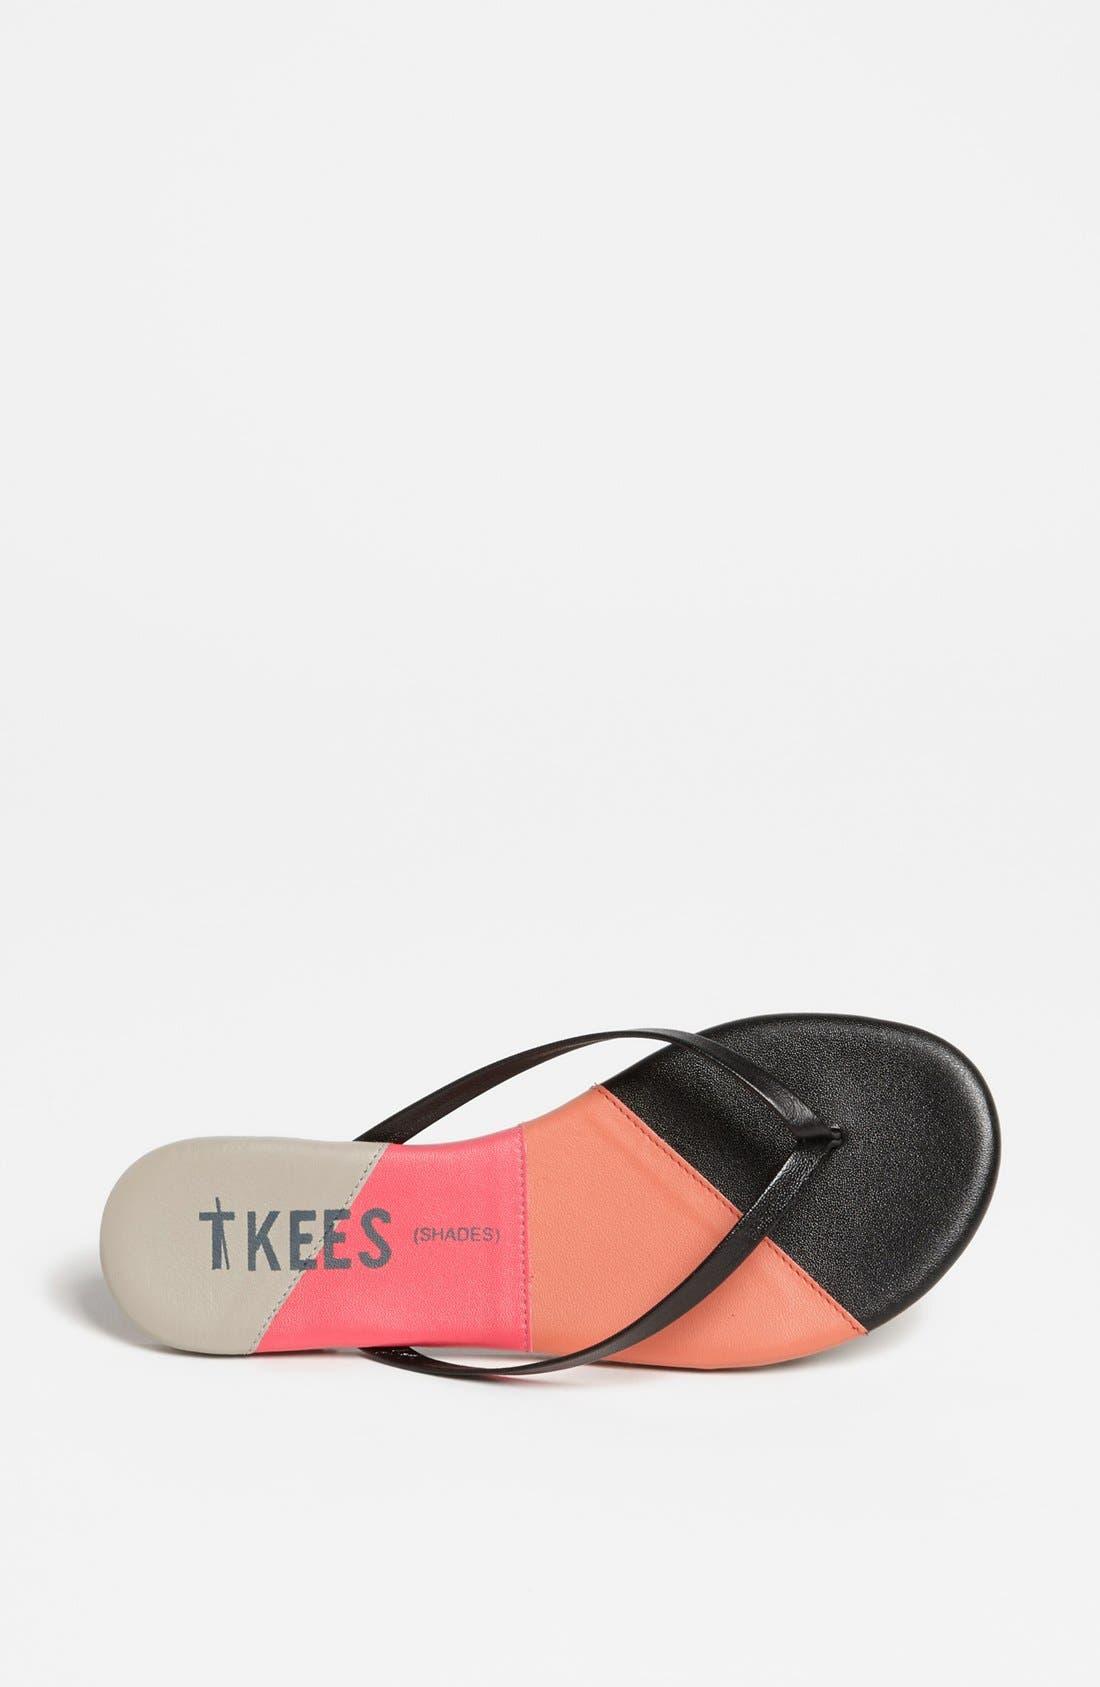 Alternate Image 3  - TKEES 'Shades' Flip Flop